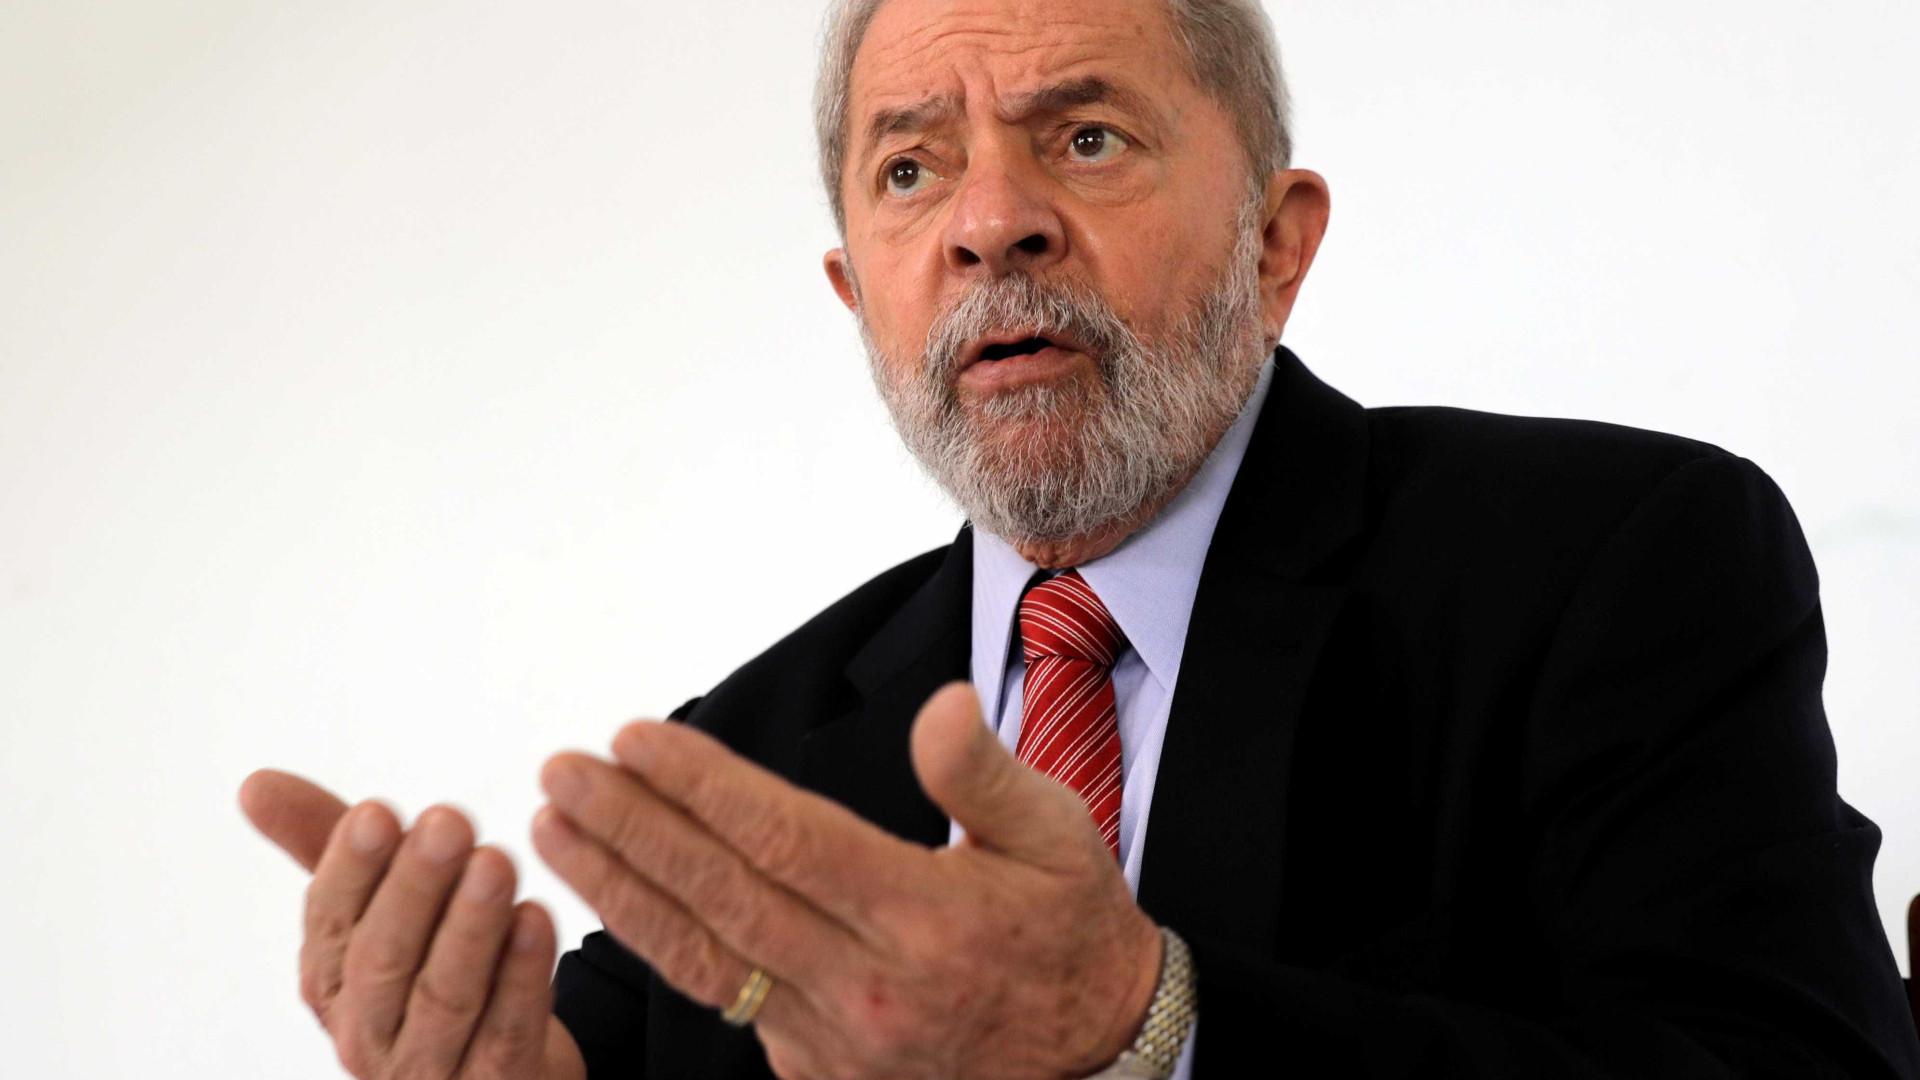 Juíza endurece prisão de Lula e reduz visitas de Haddad e de religiosos